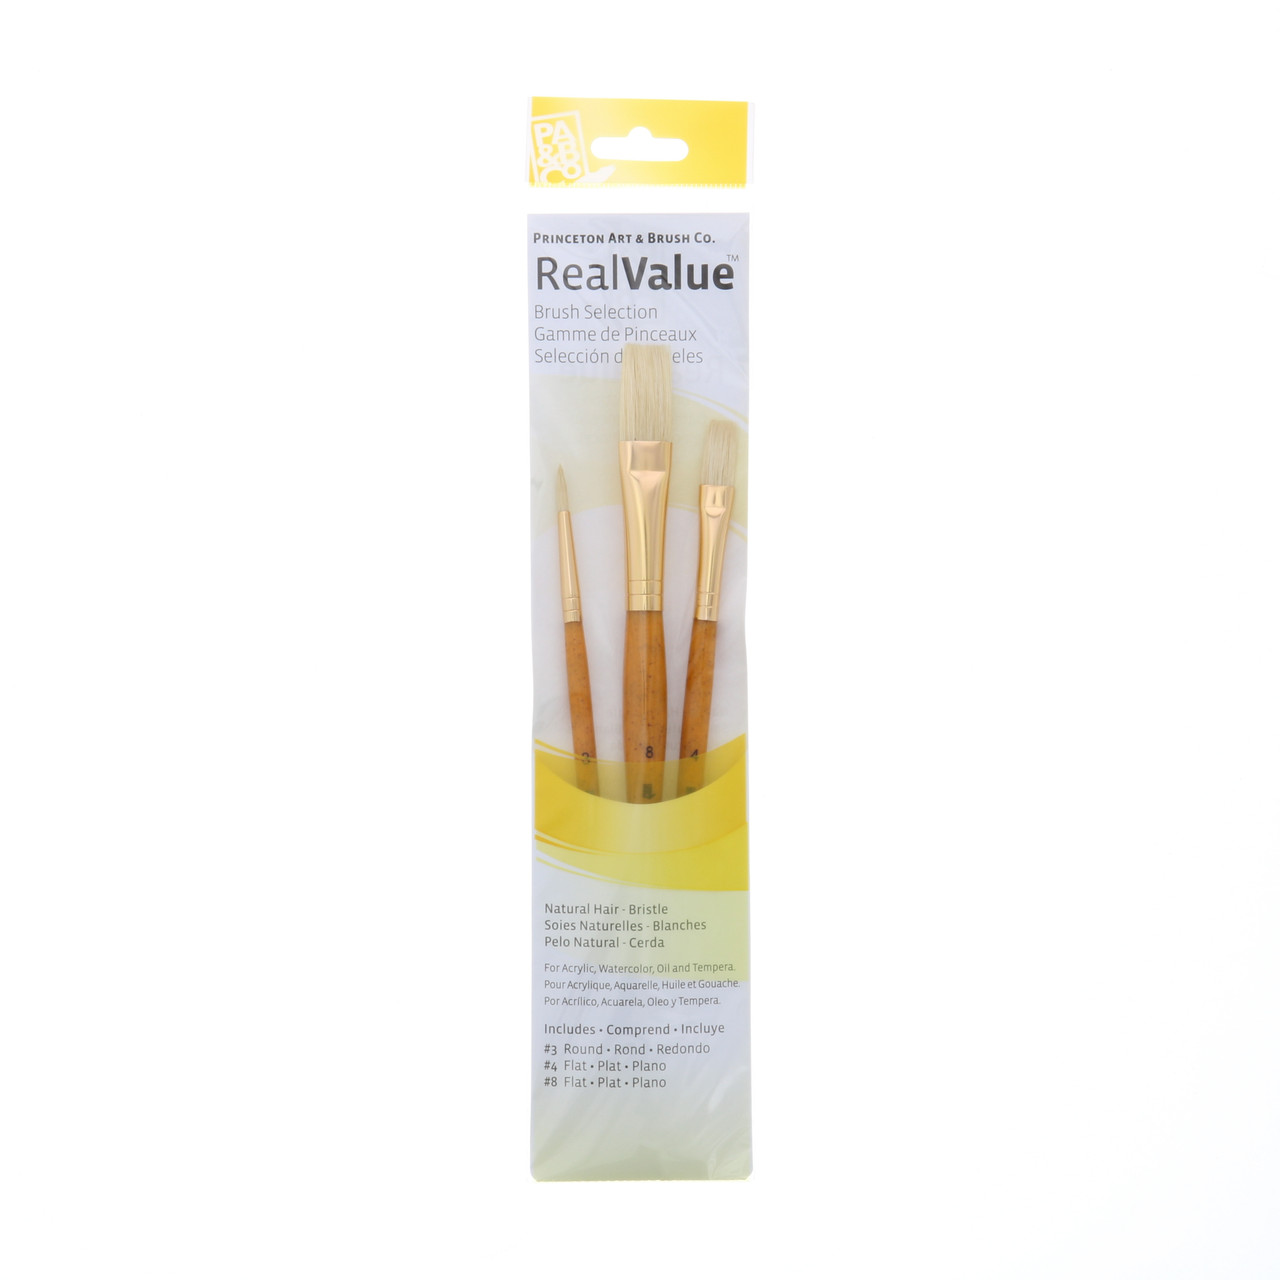 Natural-Bristle 3-Brush Set Round 3, Flat 4, 8